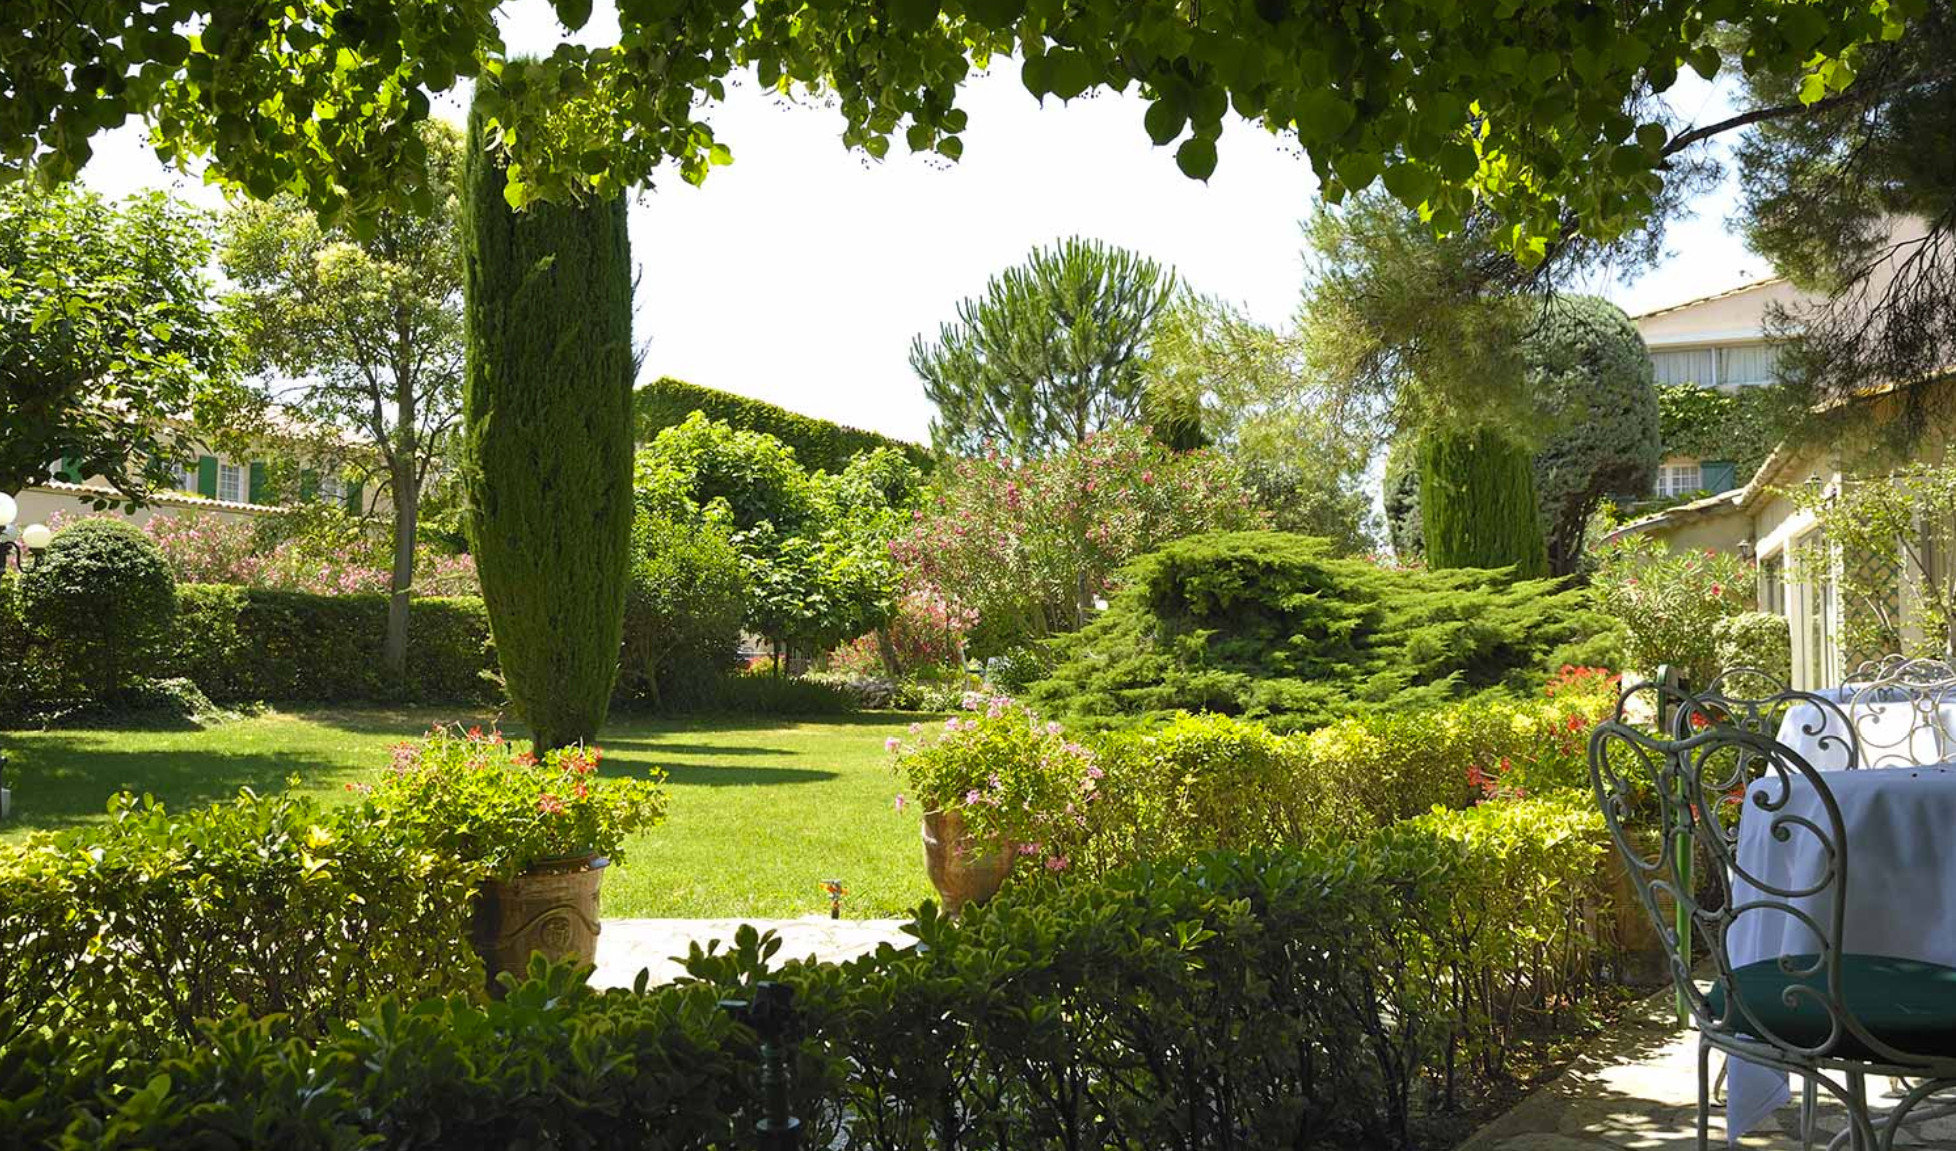 tree grass property Garden yard botany backyard house lawn plant home Courtyard park landscape architect flower botanical garden cottage landscaping stone surrounded